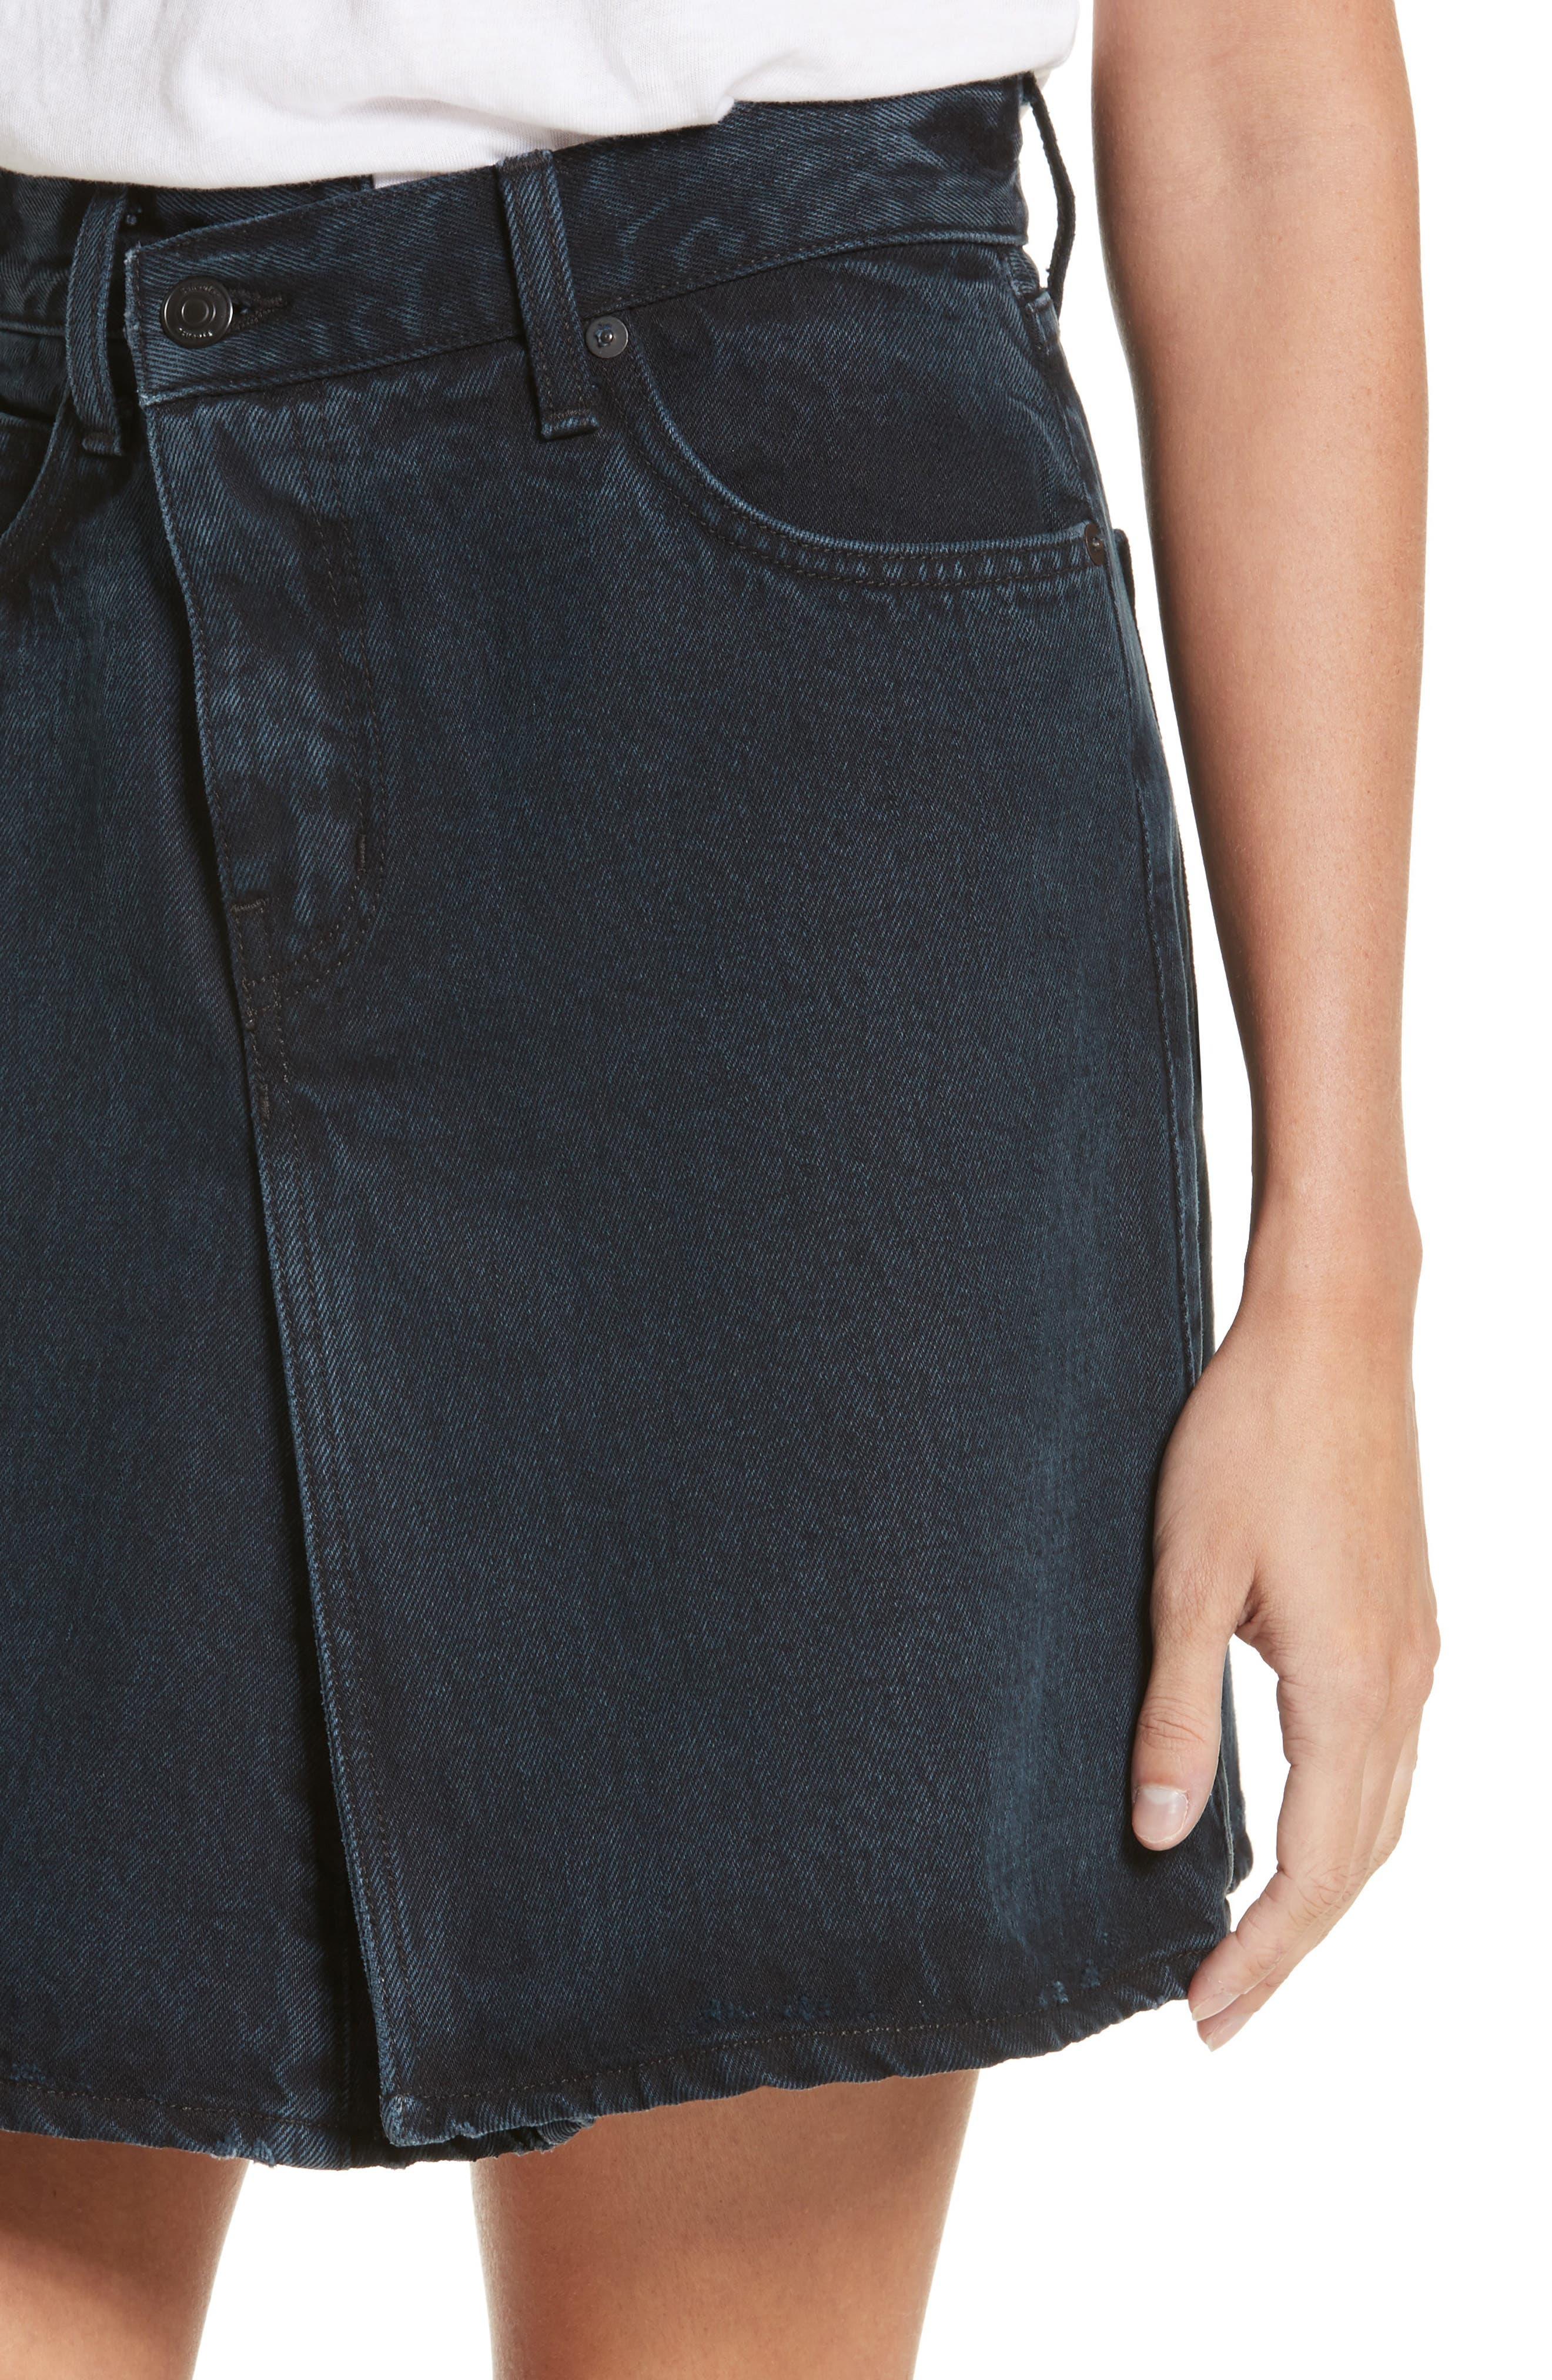 PSWL Folded Denim Skirt,                             Alternate thumbnail 4, color,                             Stone Washed Black